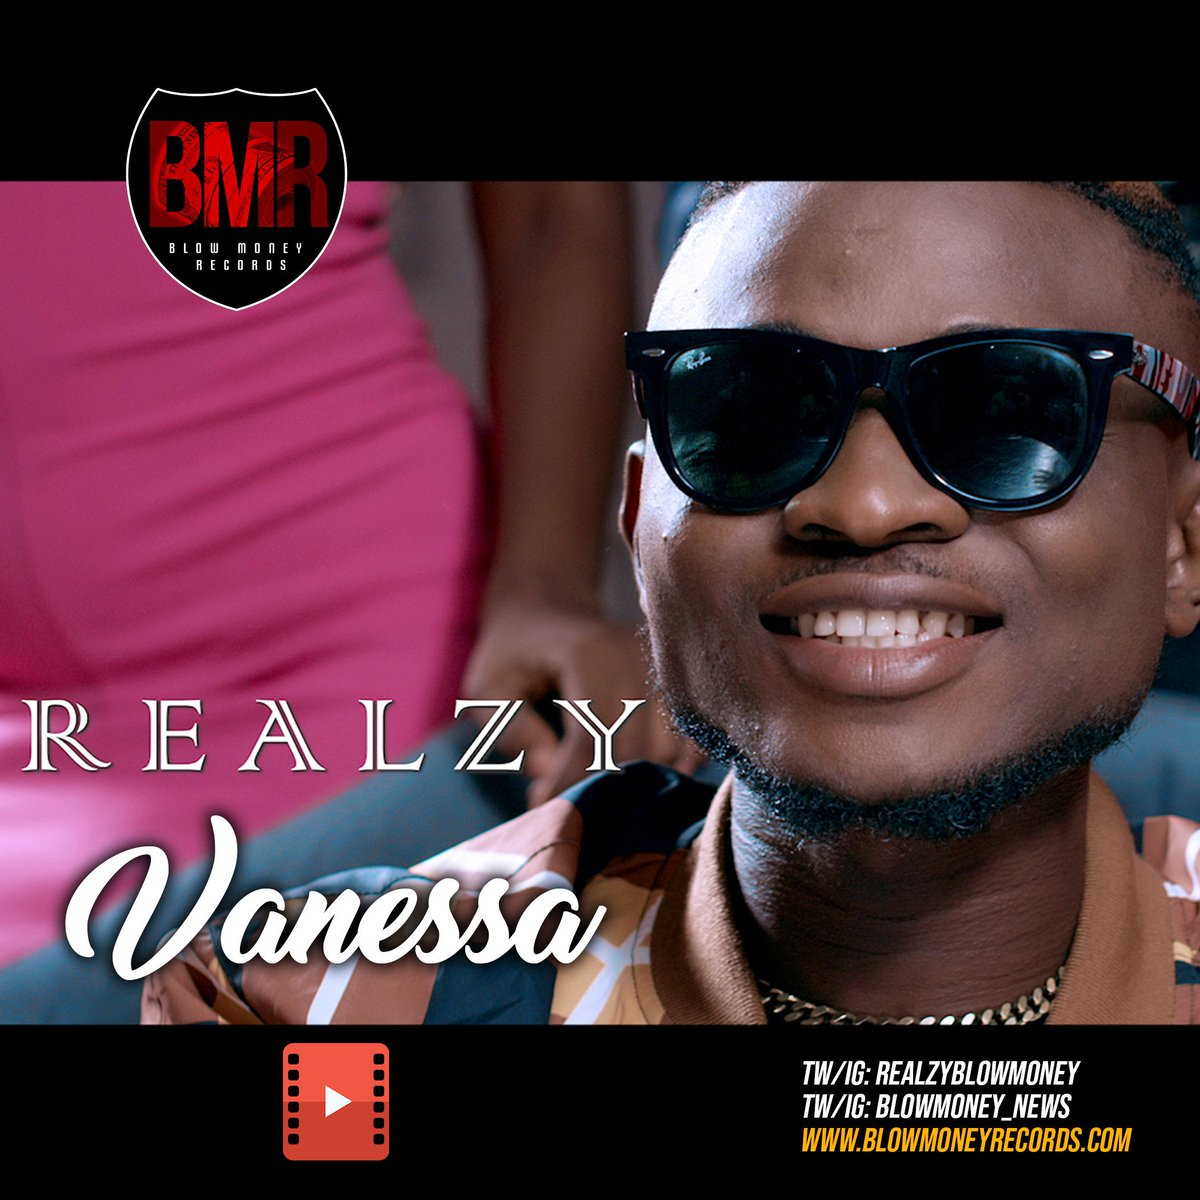 test Twitter Media - Watch Vanessa! Visuals to Realzy Single is Blazing! https://t.co/Ed2e15oxsF https://t.co/vpogdDJPY4